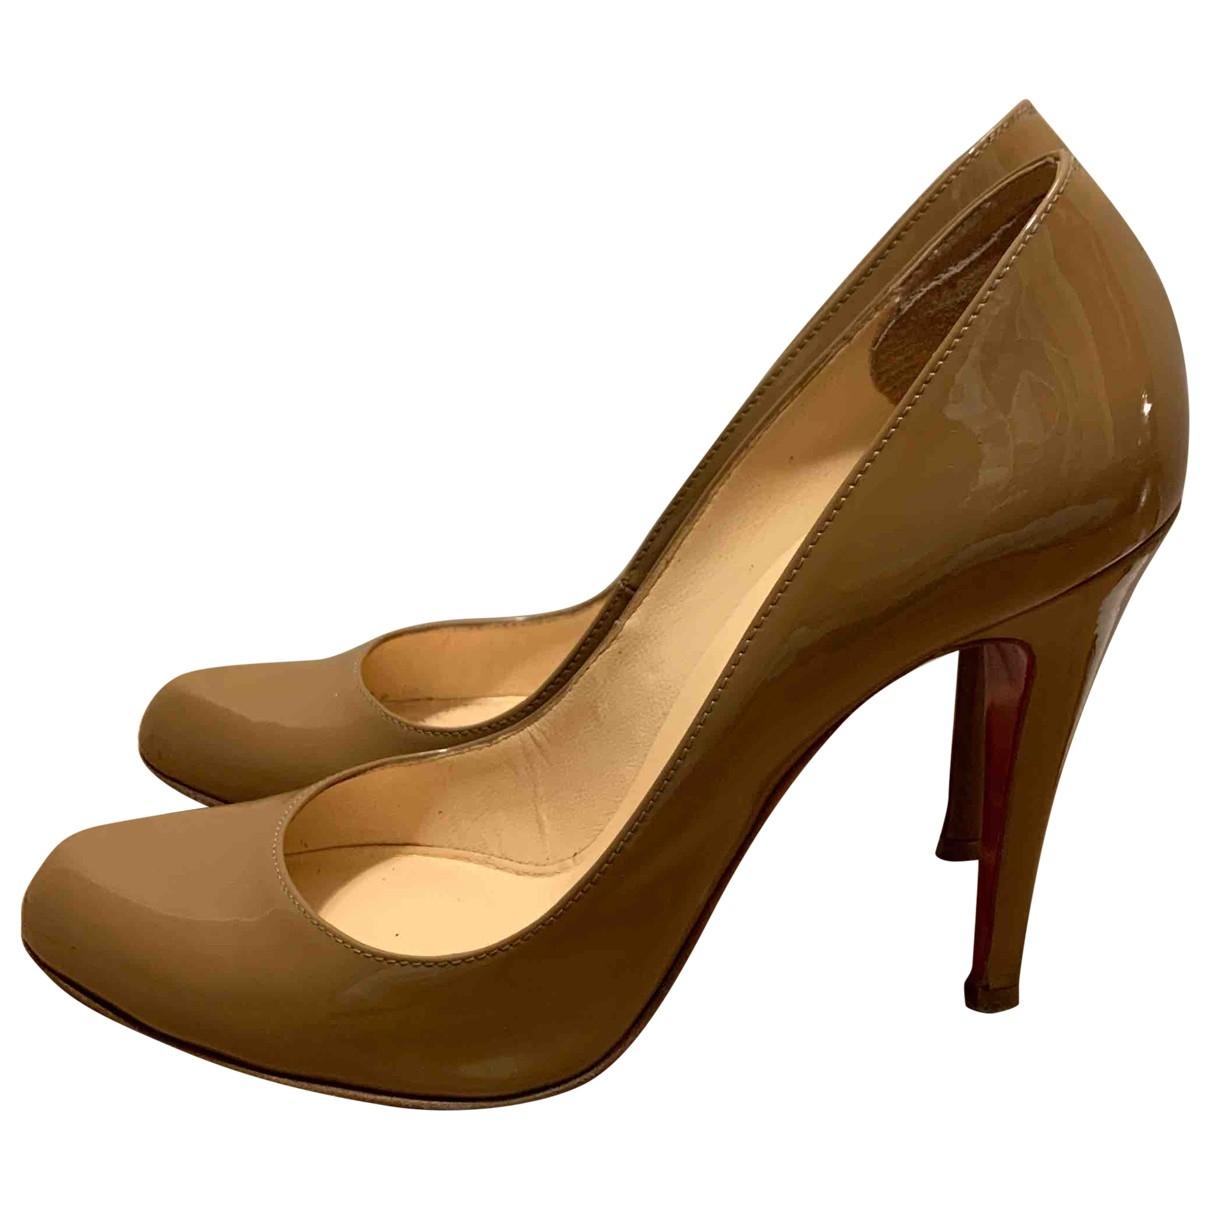 Christian Louboutin \N Camel Patent leather Heels for Women 36.5 EU